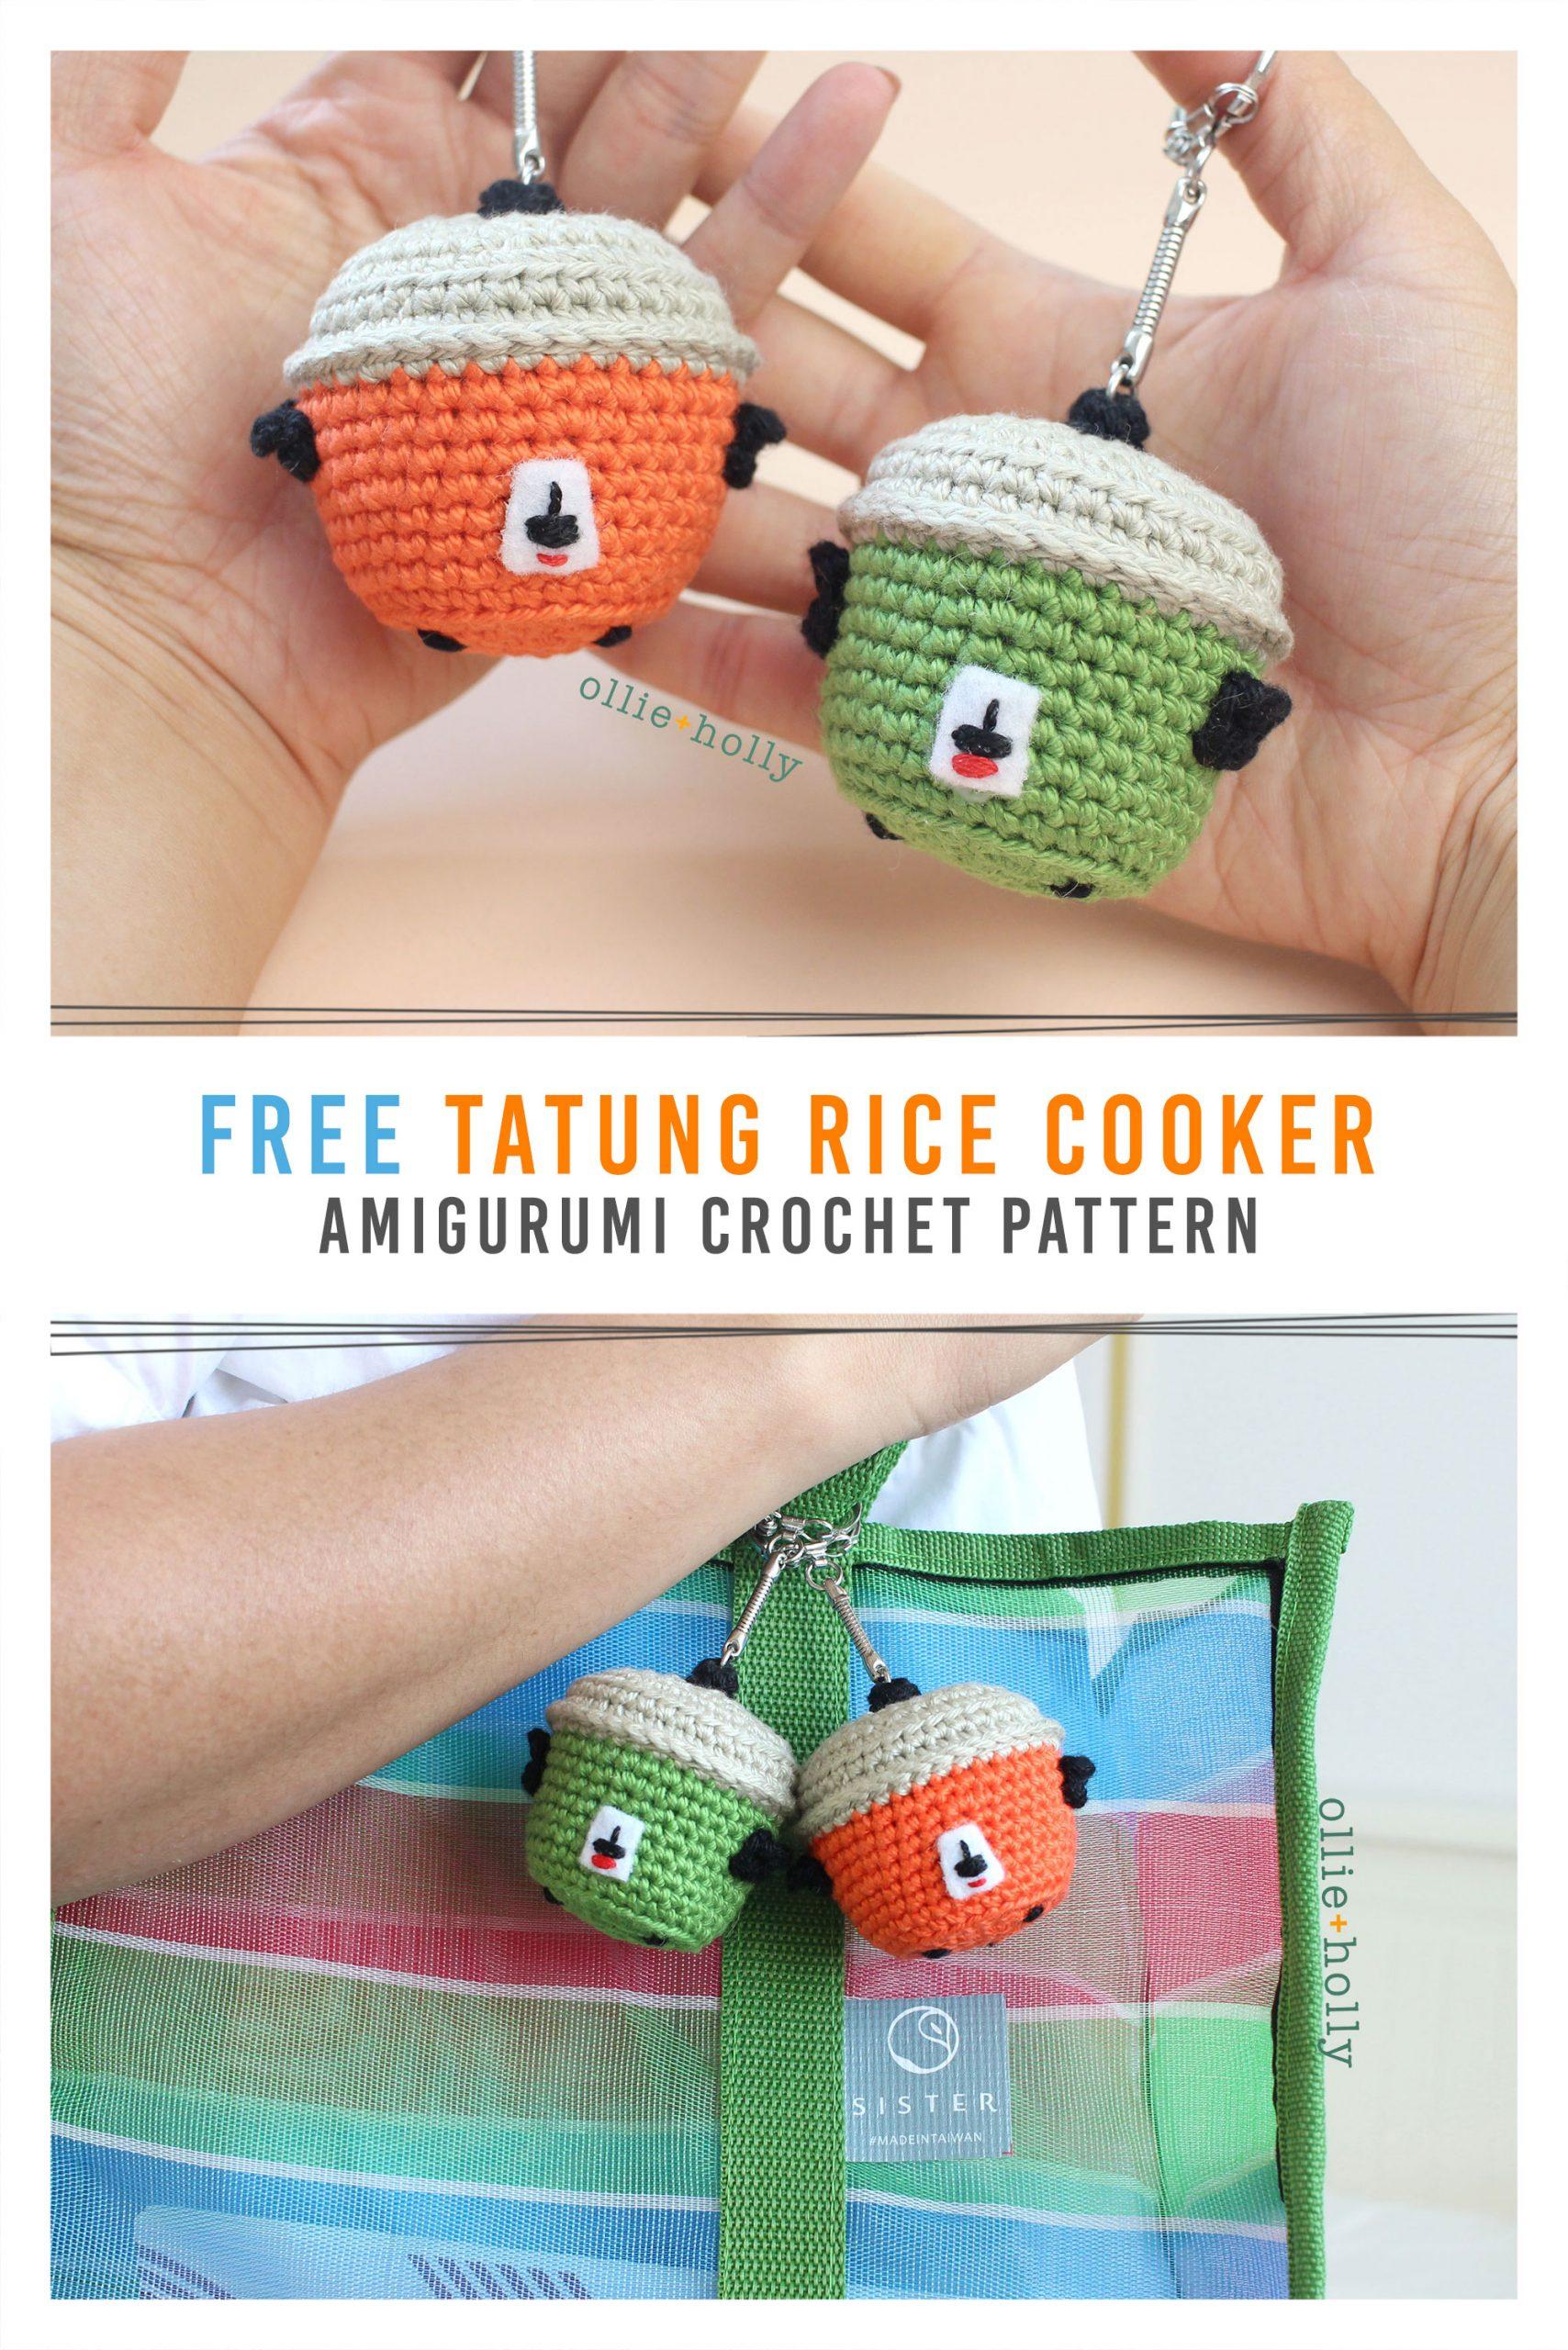 Free Taiwan Tatung Rice Cooker Amigurumi Keychain/Ornament Crochet Pattern Pinterest